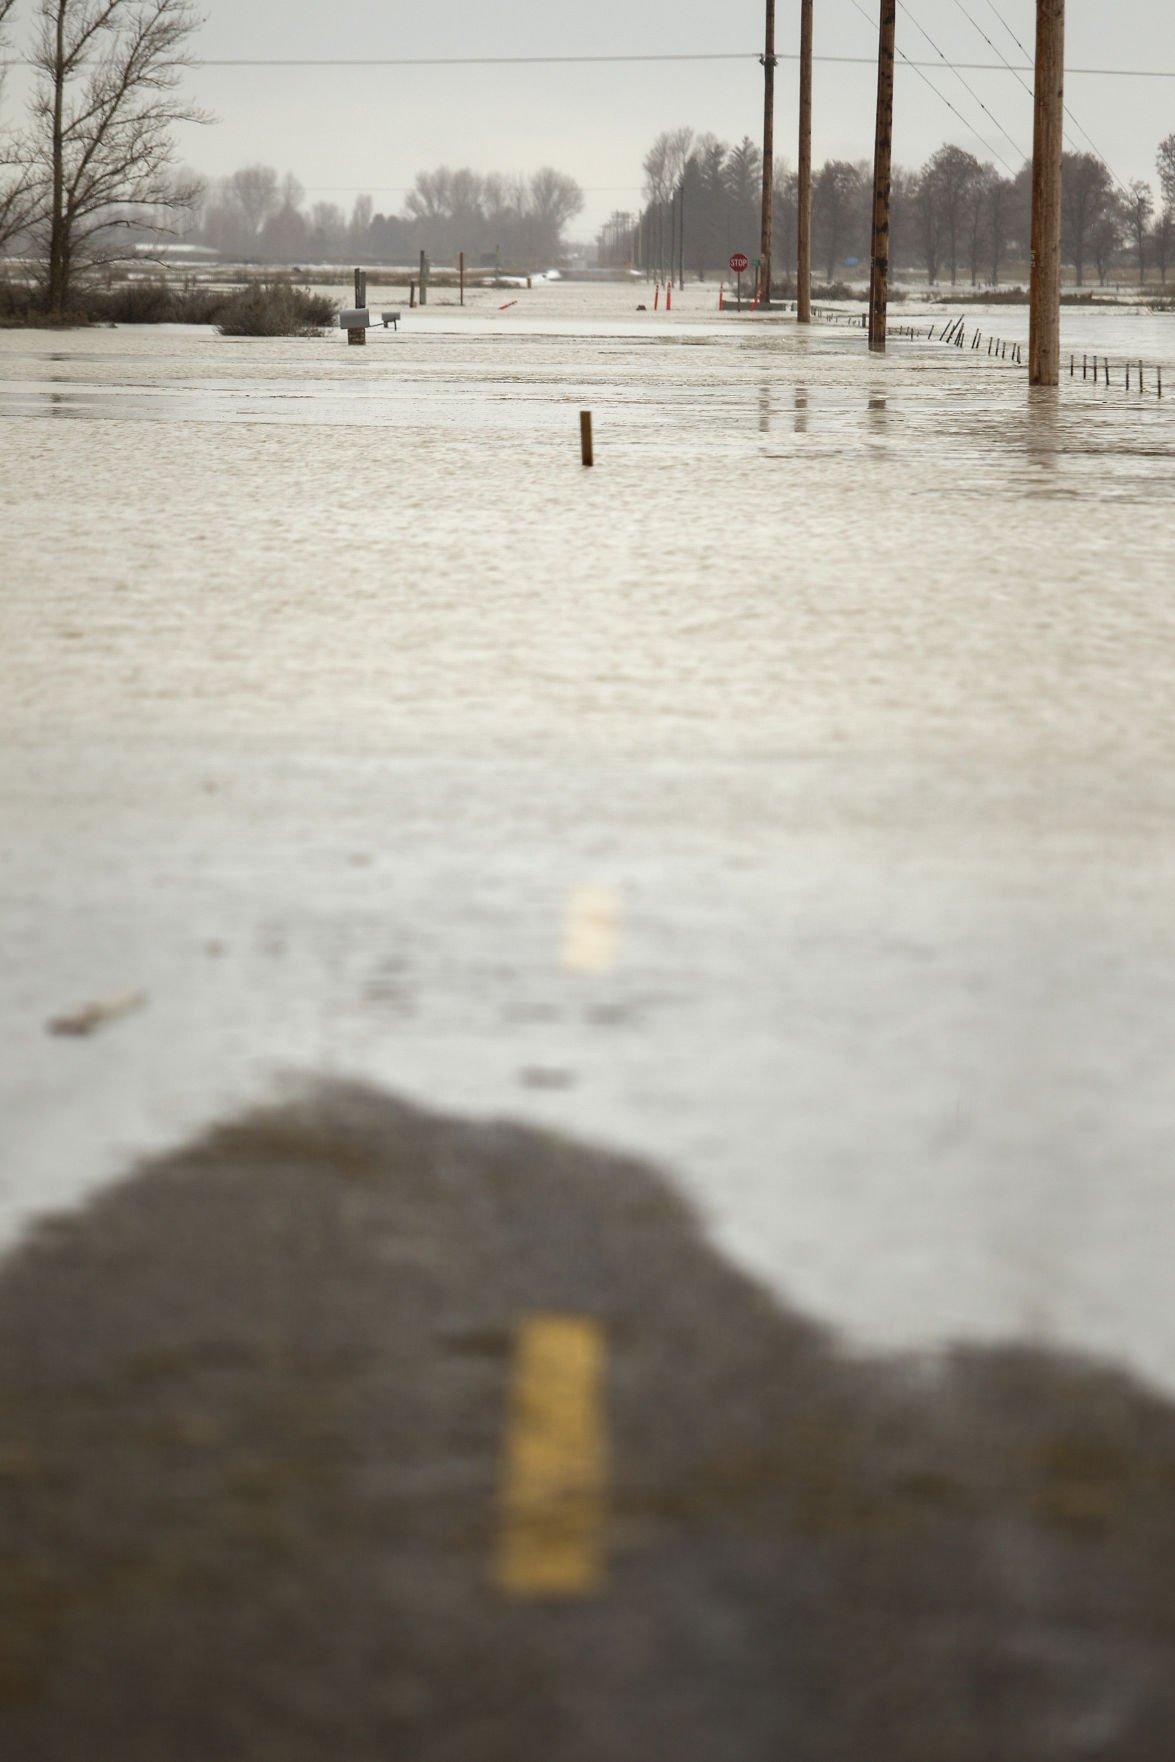 Flooding in Minidoka County